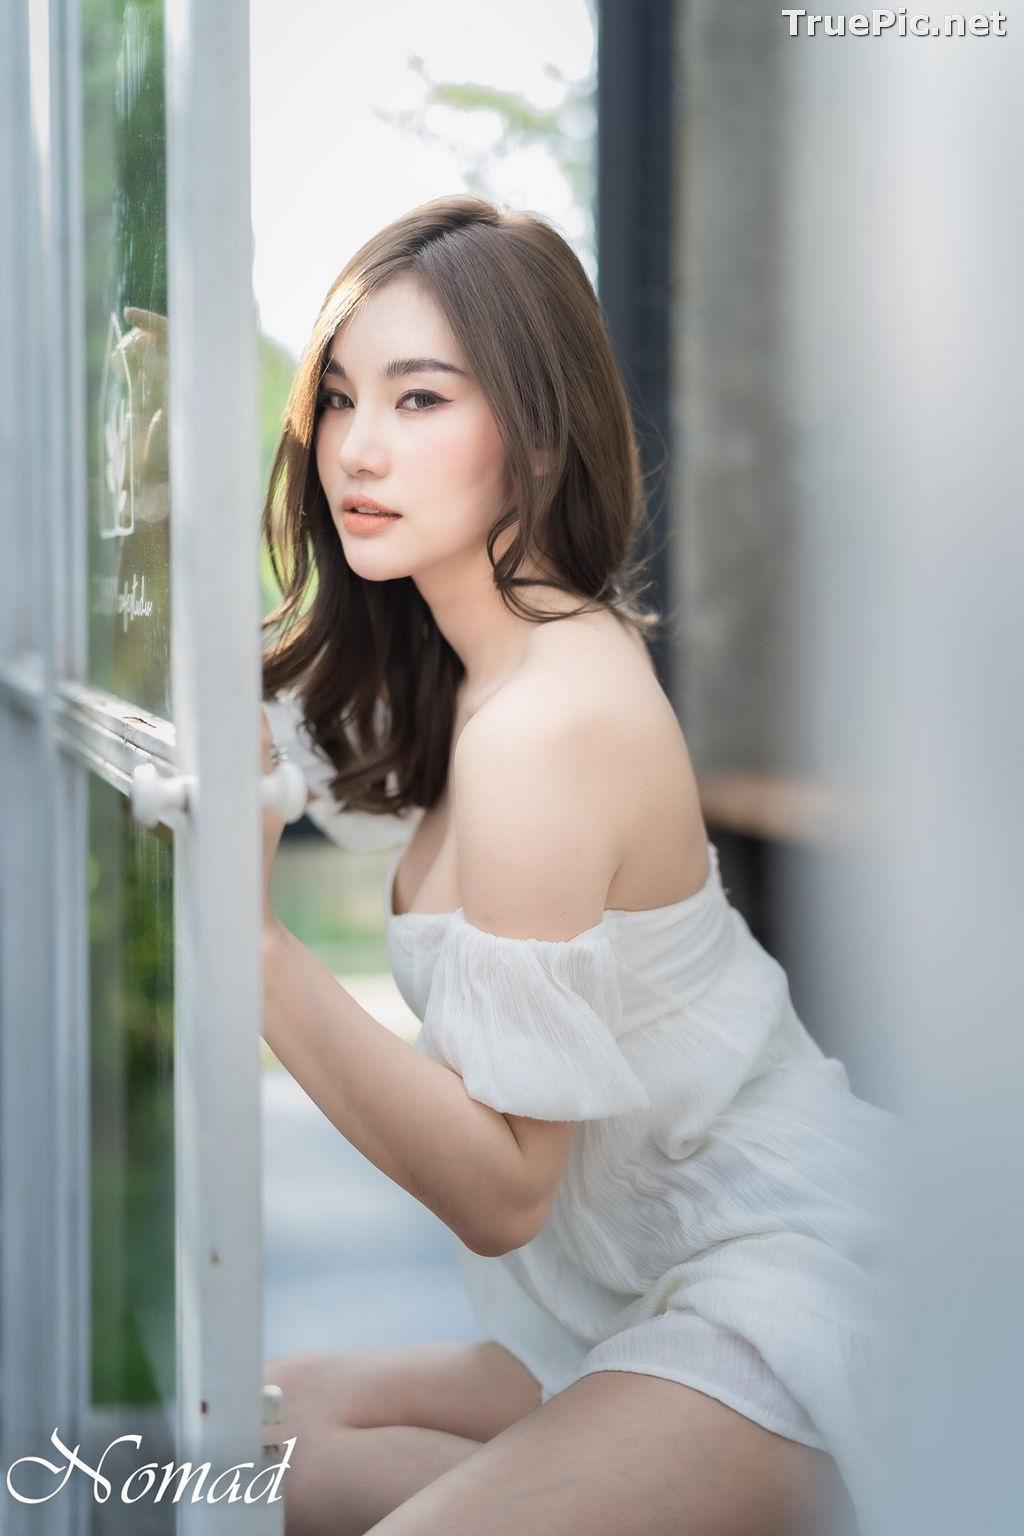 Image Thailand Model - Jarunan Tavepanya - Beautiful In Black and White - TruePic.net - Picture-1